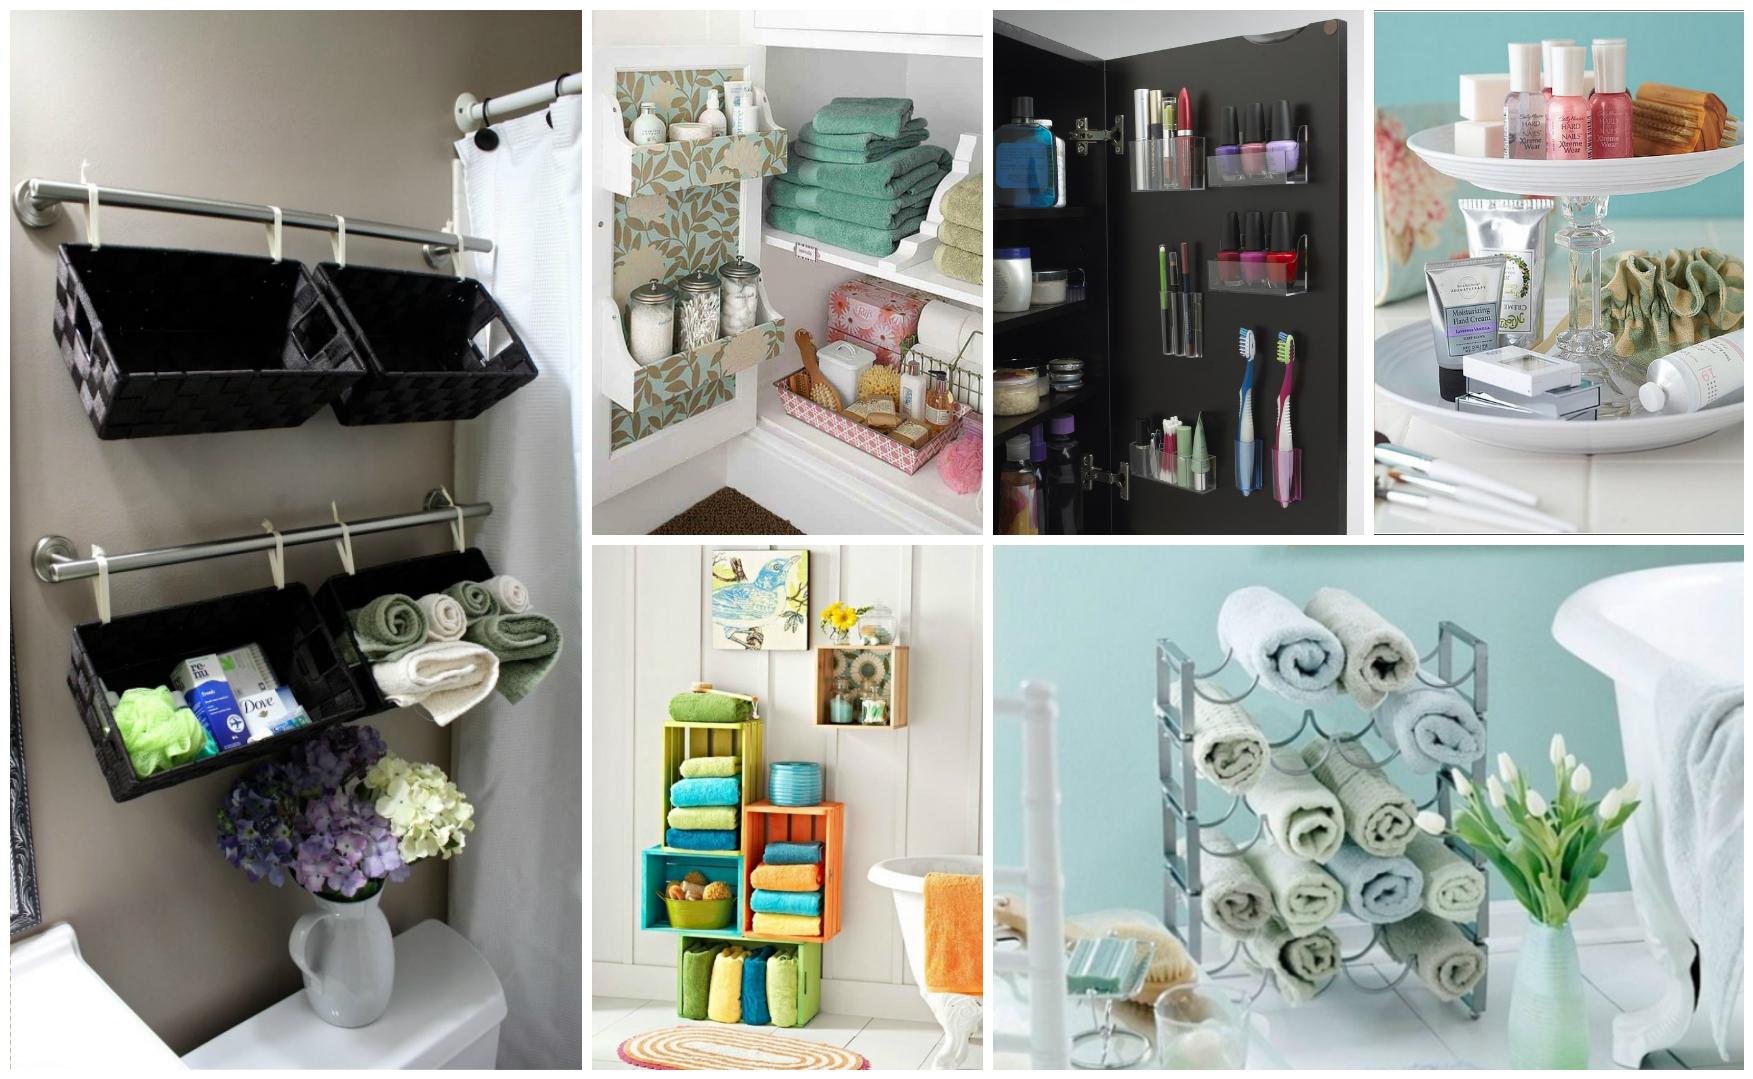 18 creative & useful diy storage ideas for tiny bathrooms 18 Storage Ideas